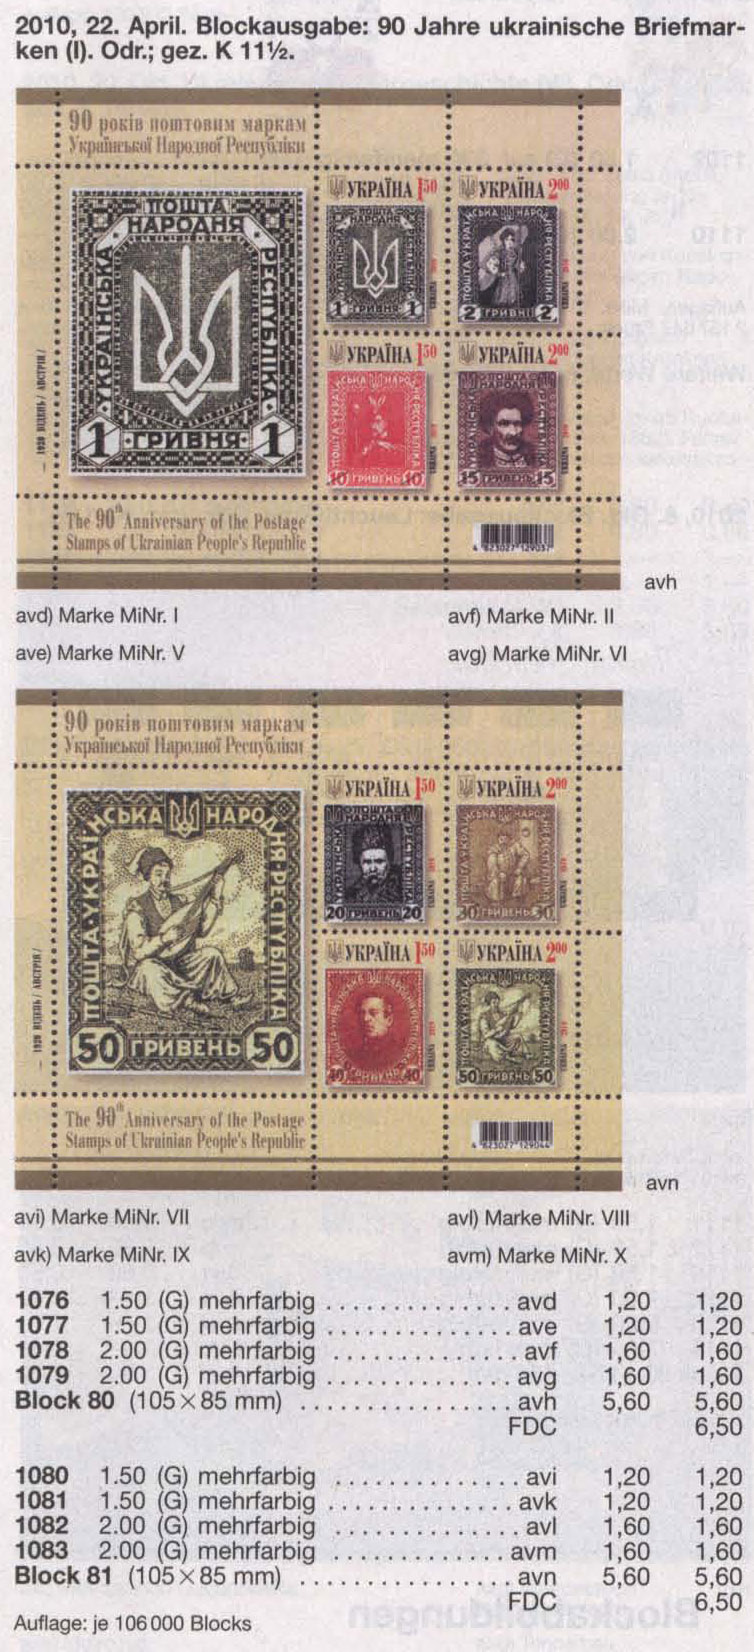 N1080-1083 (block81) каталог 2010 блок 90-лет УНР казак Мамай